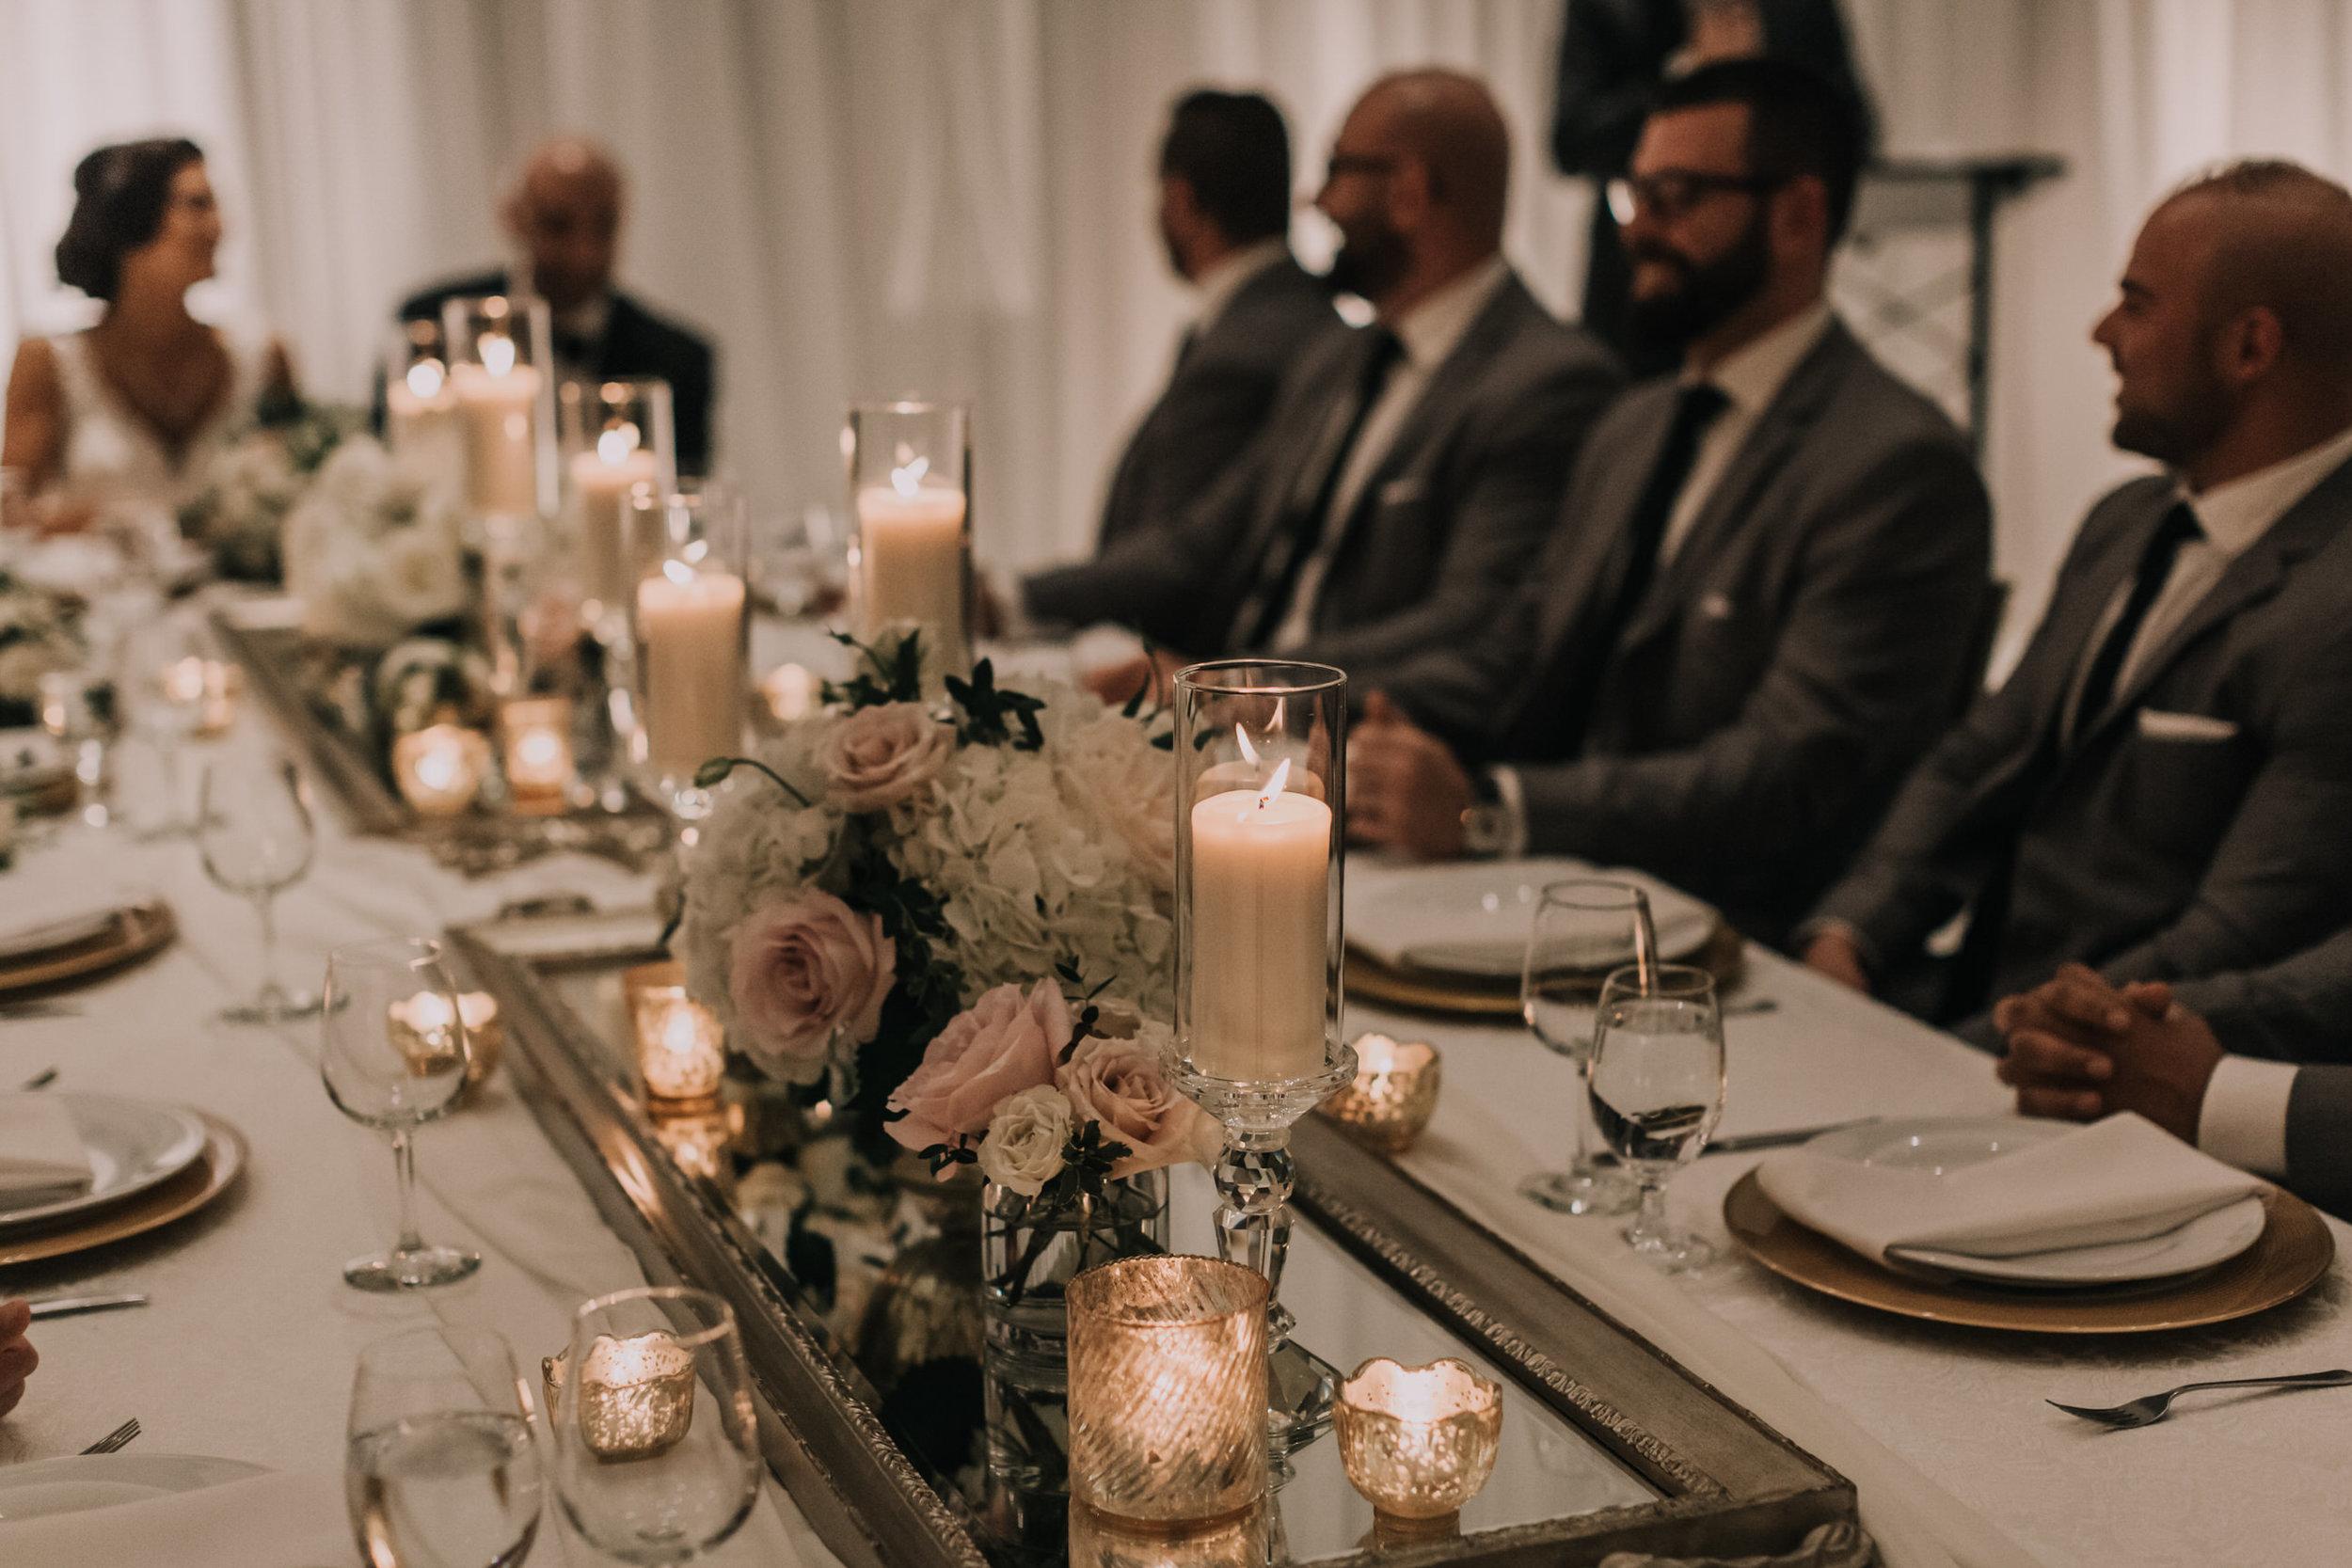 Pitt Meadows Wedding Photographer - Sky Hangar Wedding Photos - Vancouver Wedding Photographer & Videographer - Sunshine Coast Wedding Photos - Sunshine Coast Wedding Photographer - Jennifer Picard Photography - IMG_6094.jpg